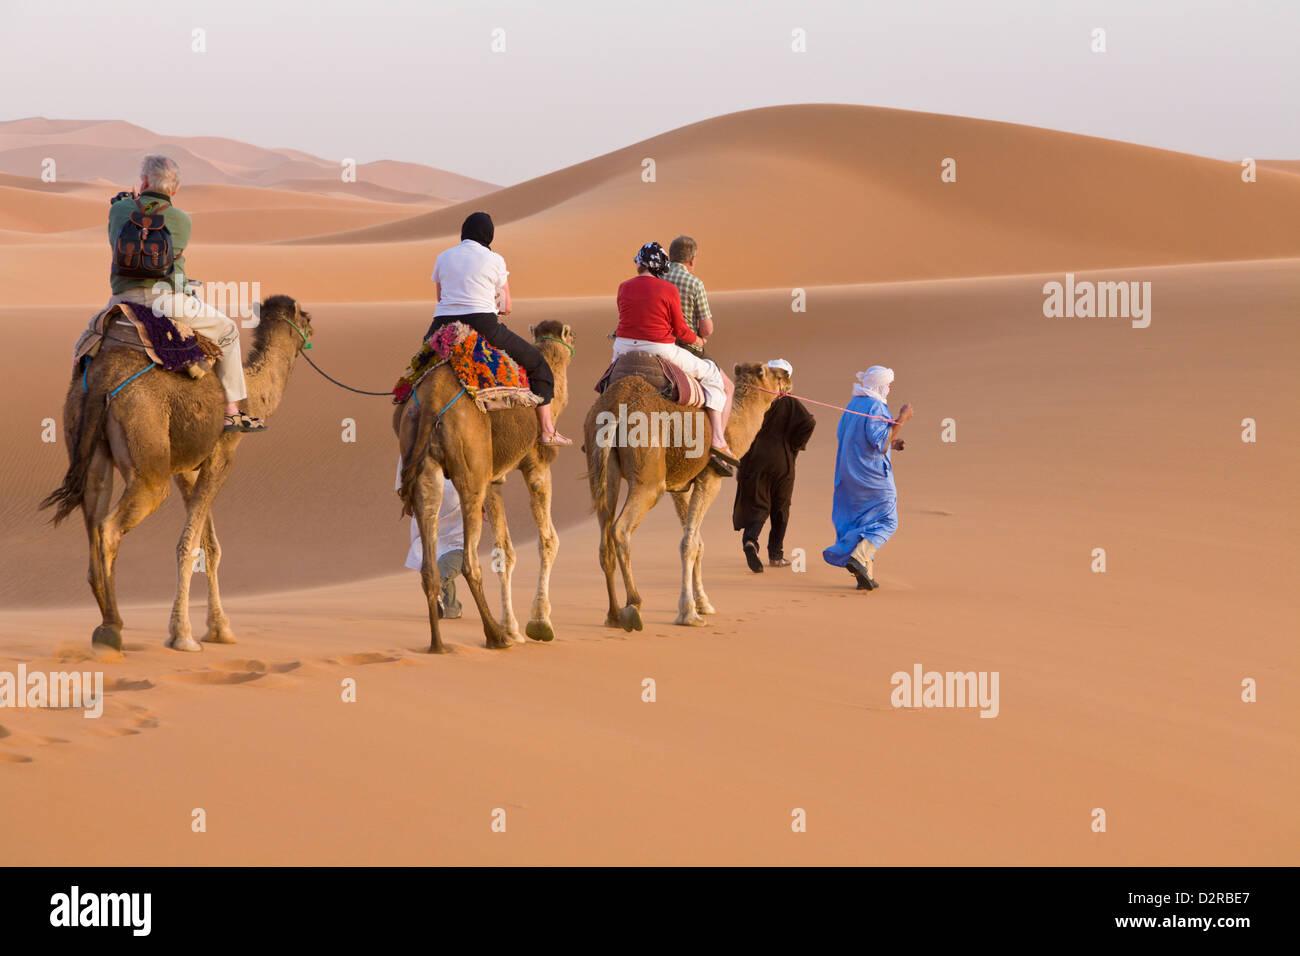 Tourists on a camel ride Merzouga Dunes Sahara Morocco Stock Photo